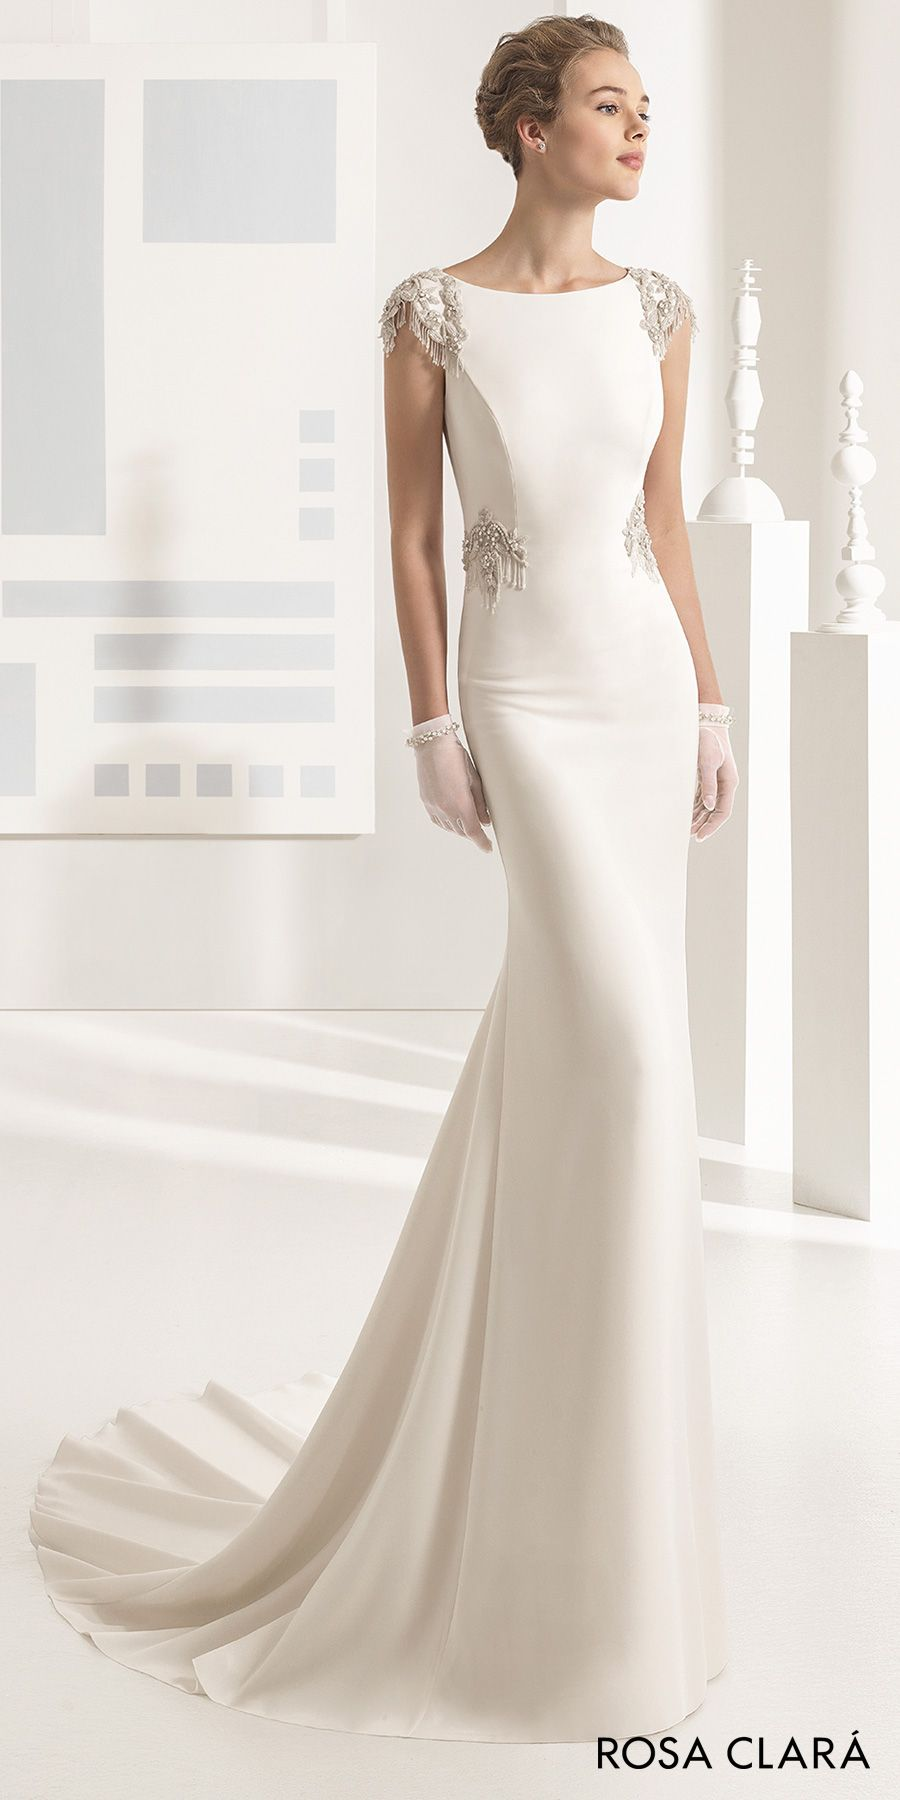 Rosa Clara 2017 Bridal Collection These Wedding Dresses Feature Unforgettable Details Wedding Inspirasi Wedding Dress Long Sleeve Wedding Dresses Sheath Wedding Dress [ 1800 x 900 Pixel ]